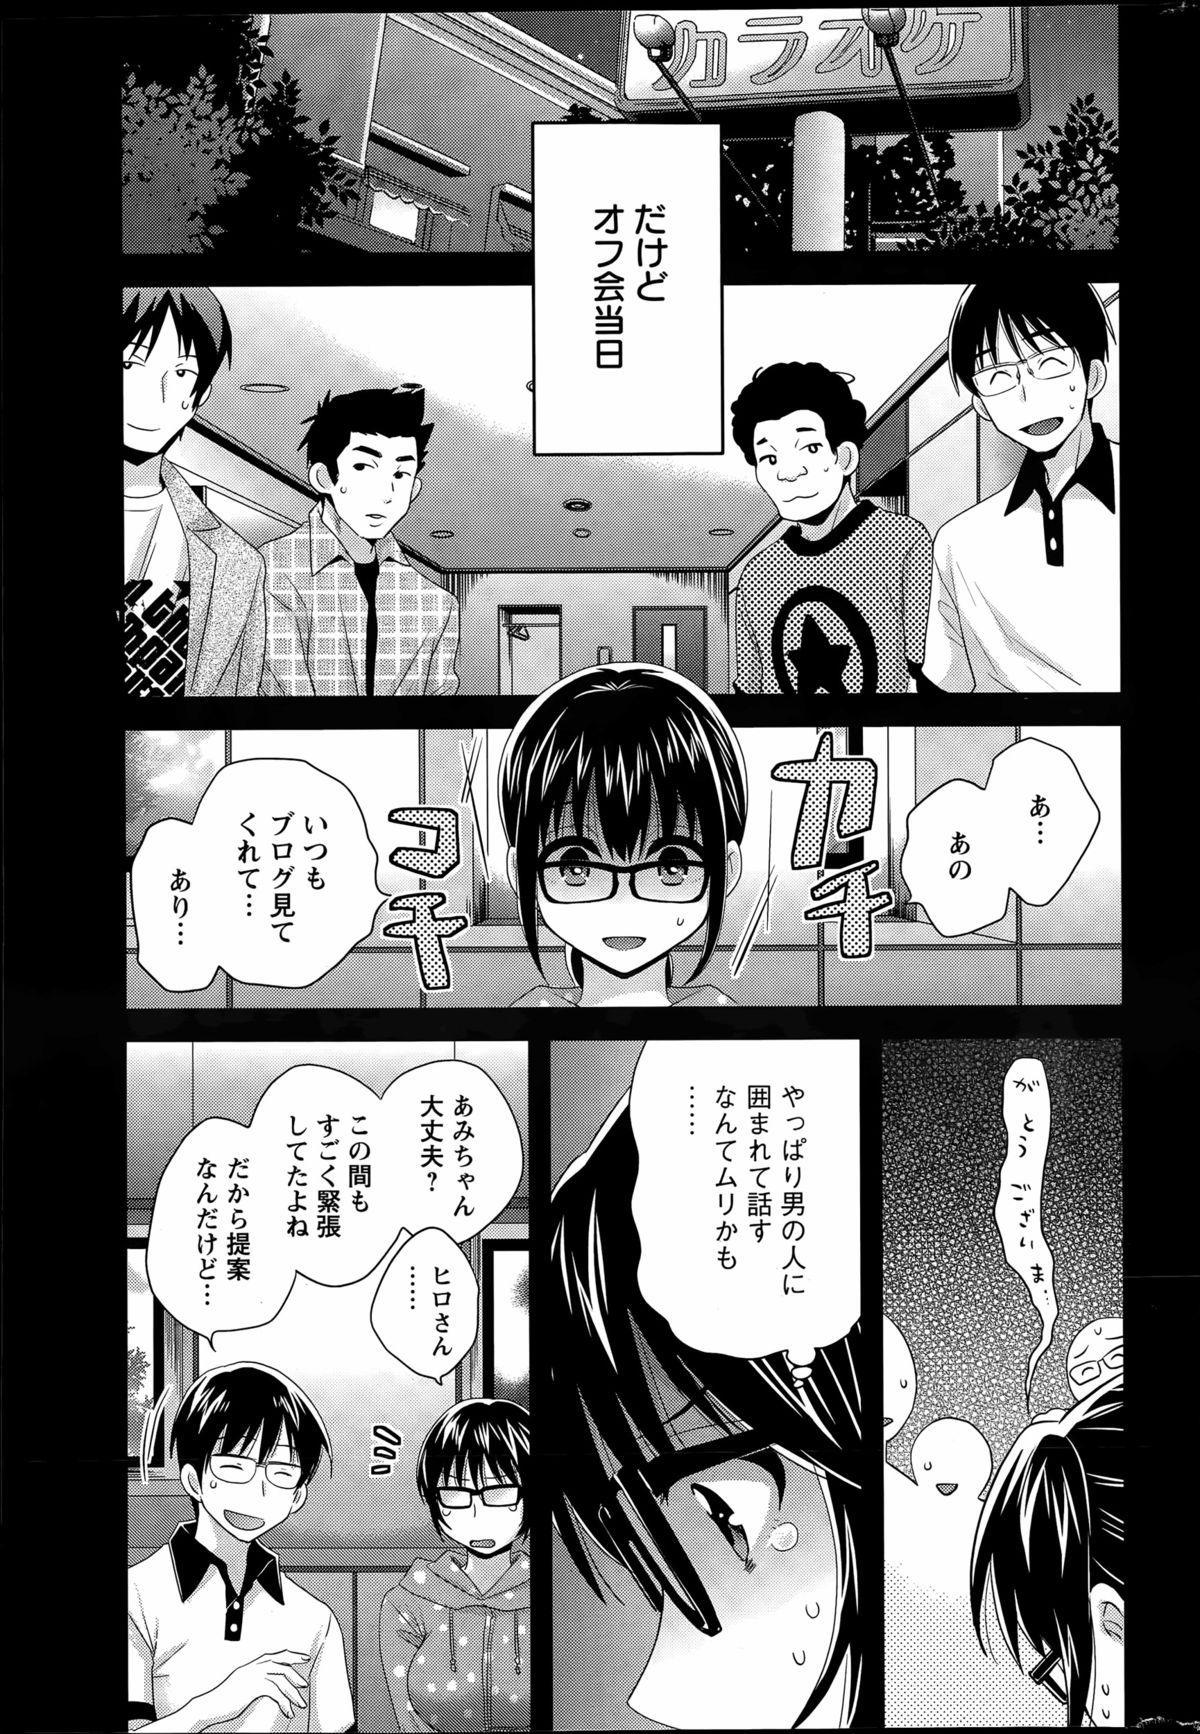 [Pon Takahanada] Otani-san no Cosplay Jijou Ch. 1-5 22